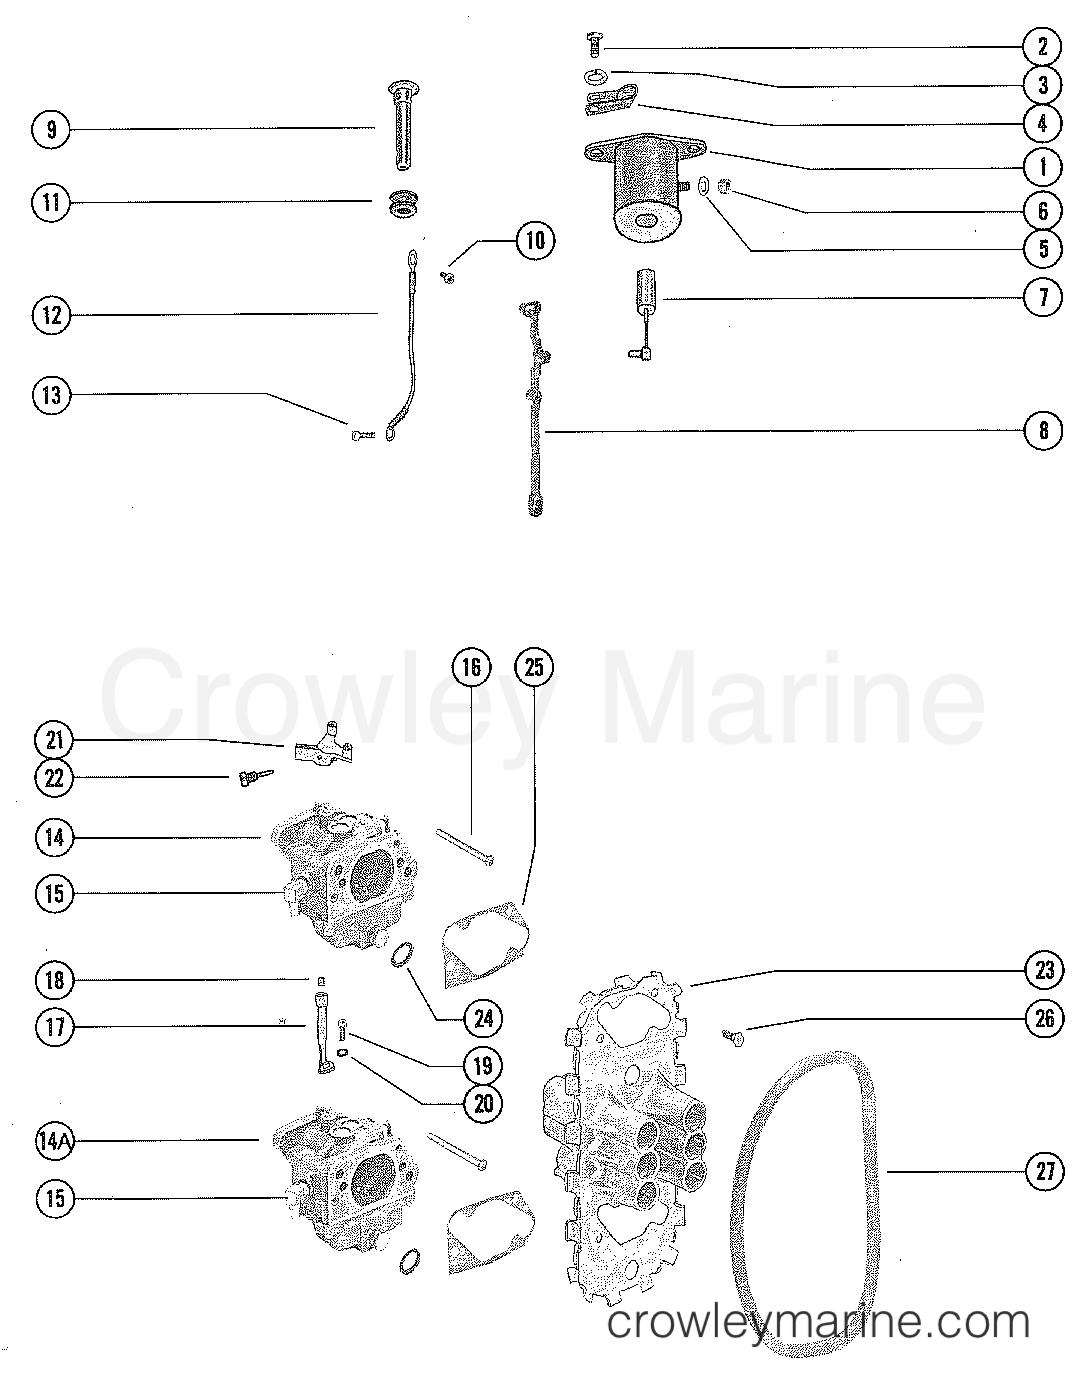 Carburetor Linkage